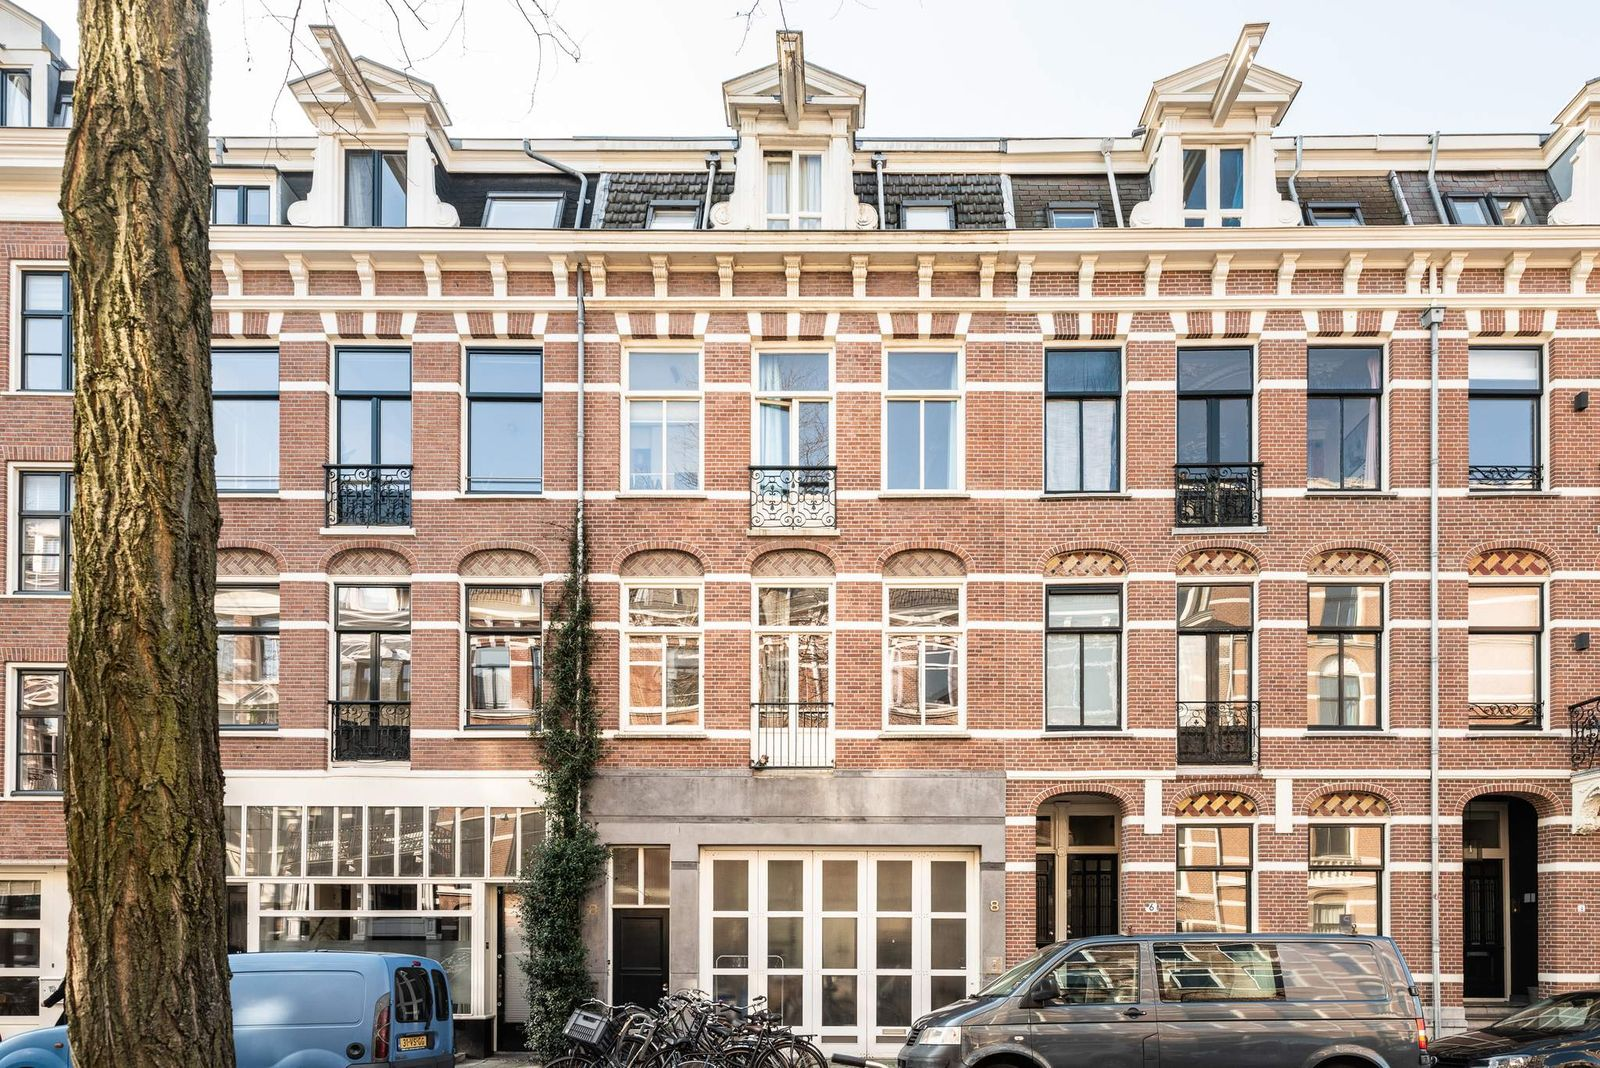 Blasiusstraat 8-2, Amsterdam